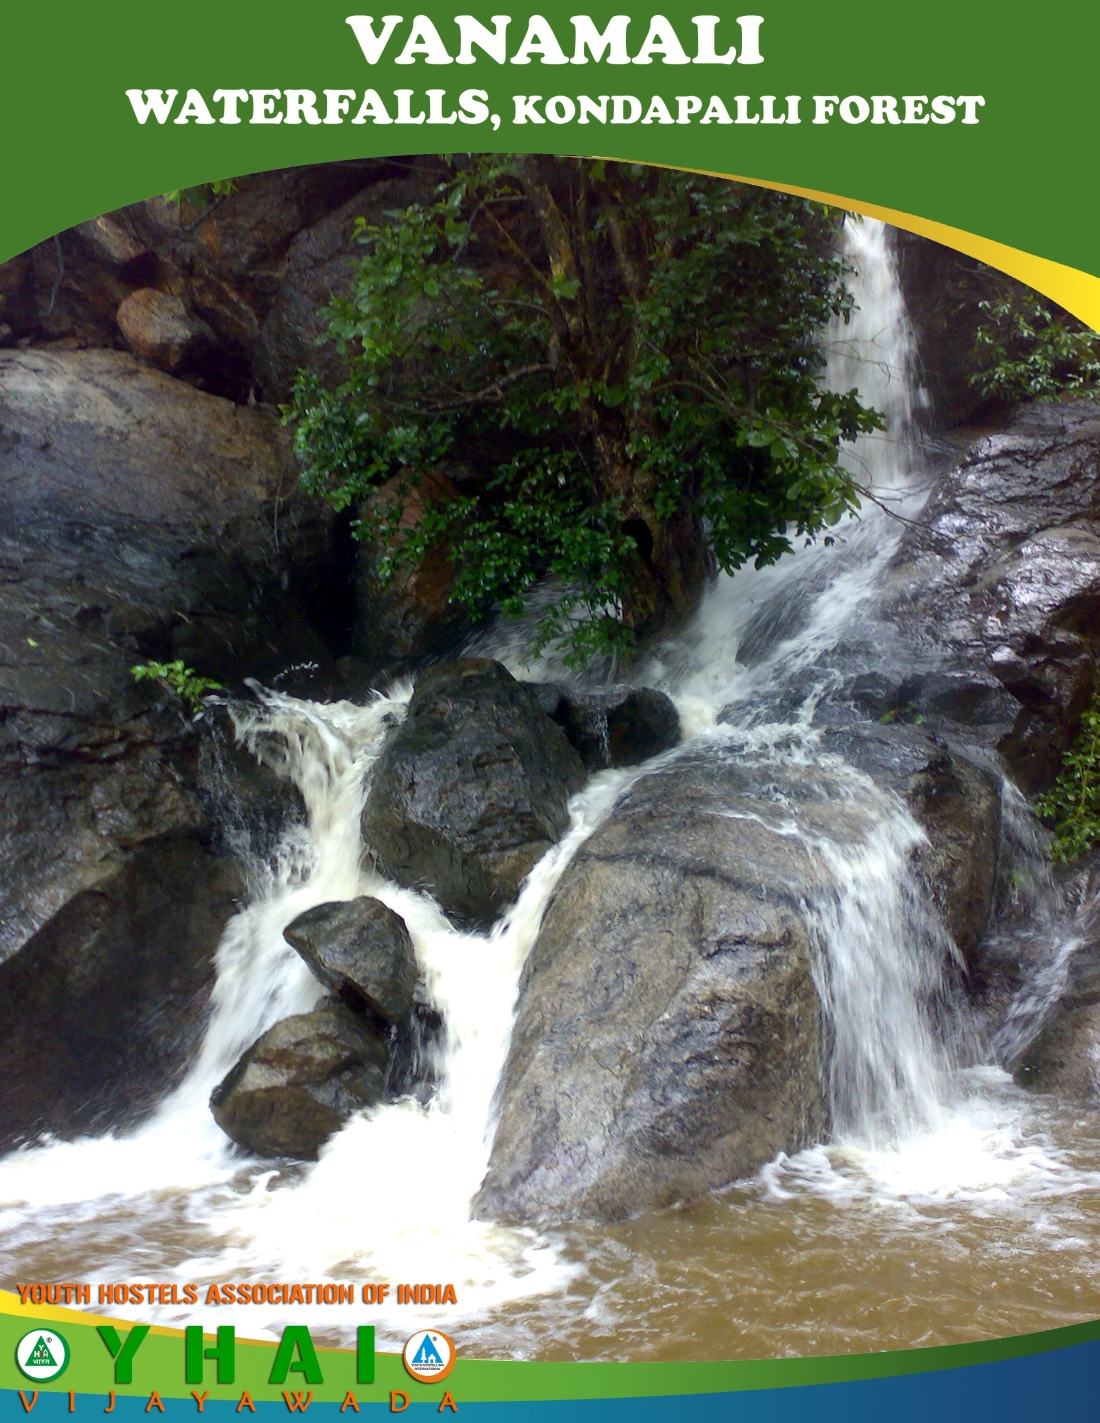 Vanamali WaterFalls - Kondapalli Forest